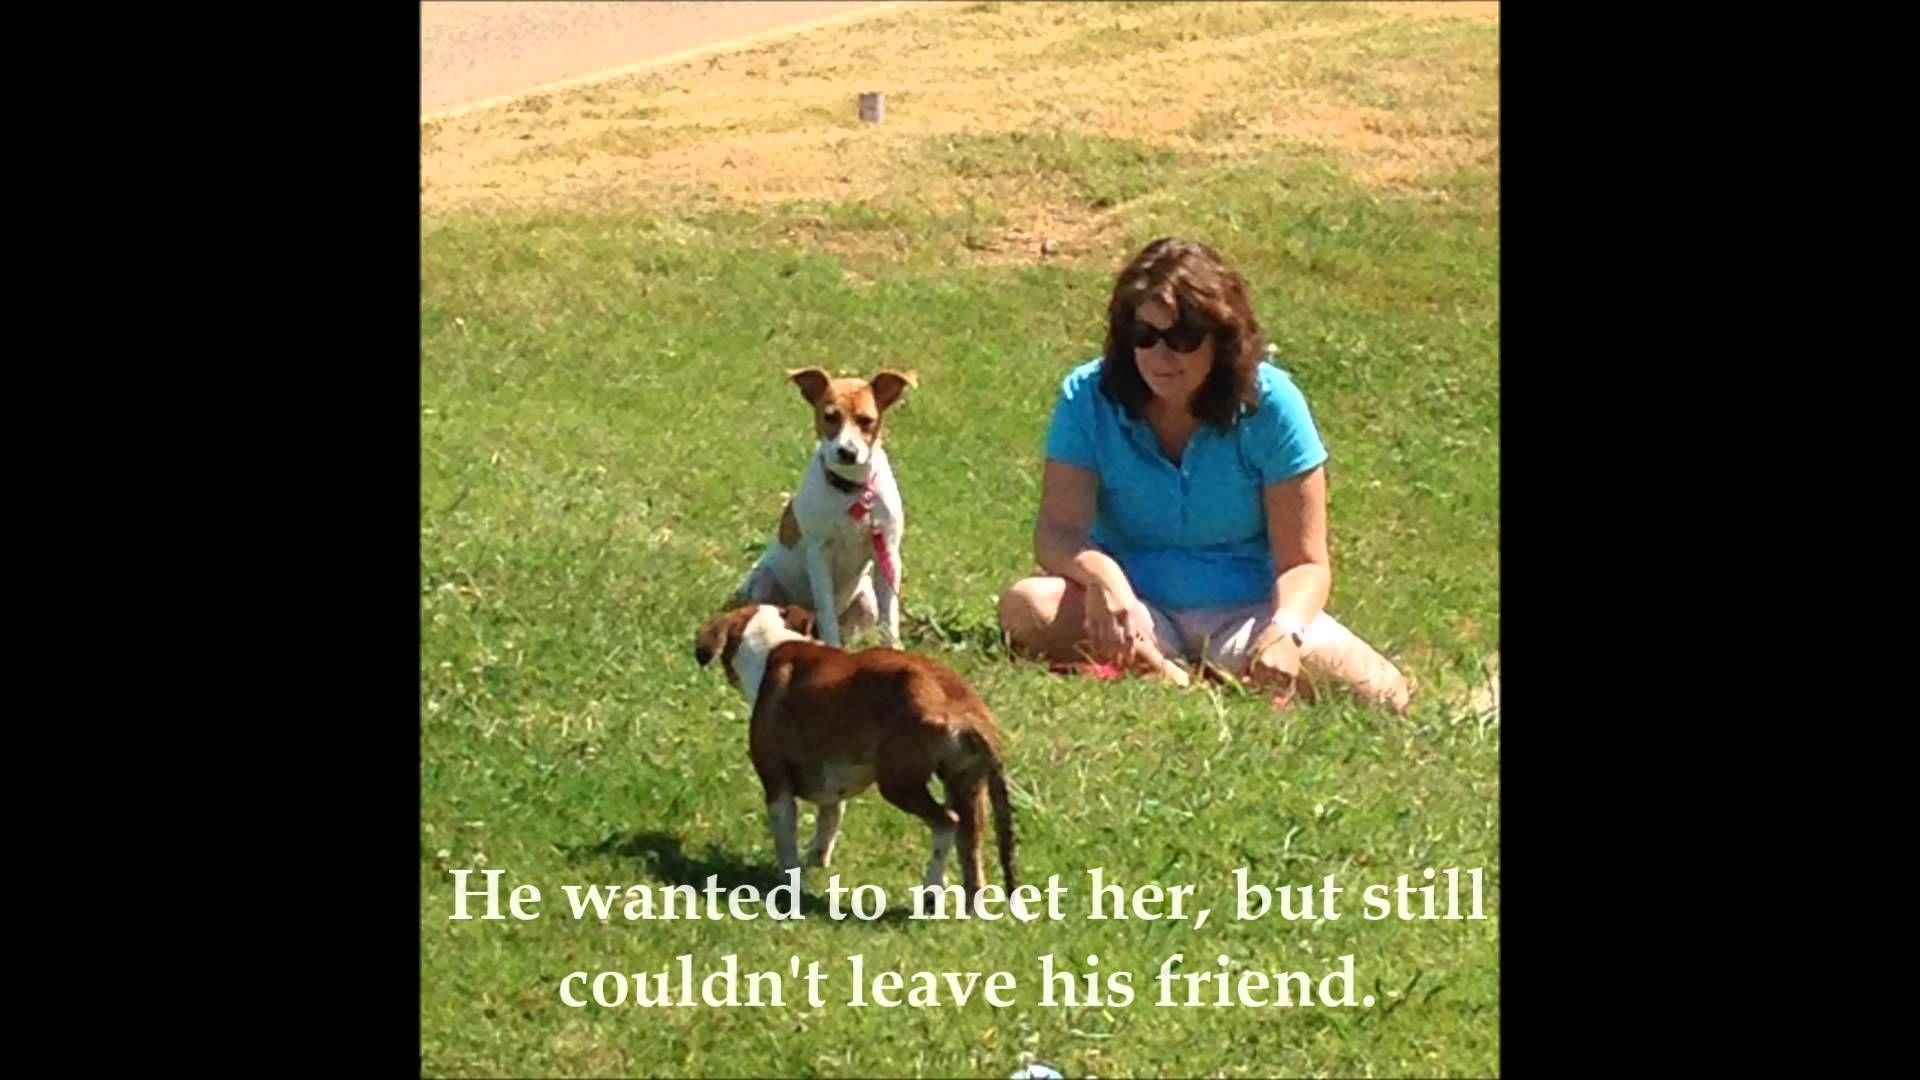 Faithful street dog won't leave his companion Street